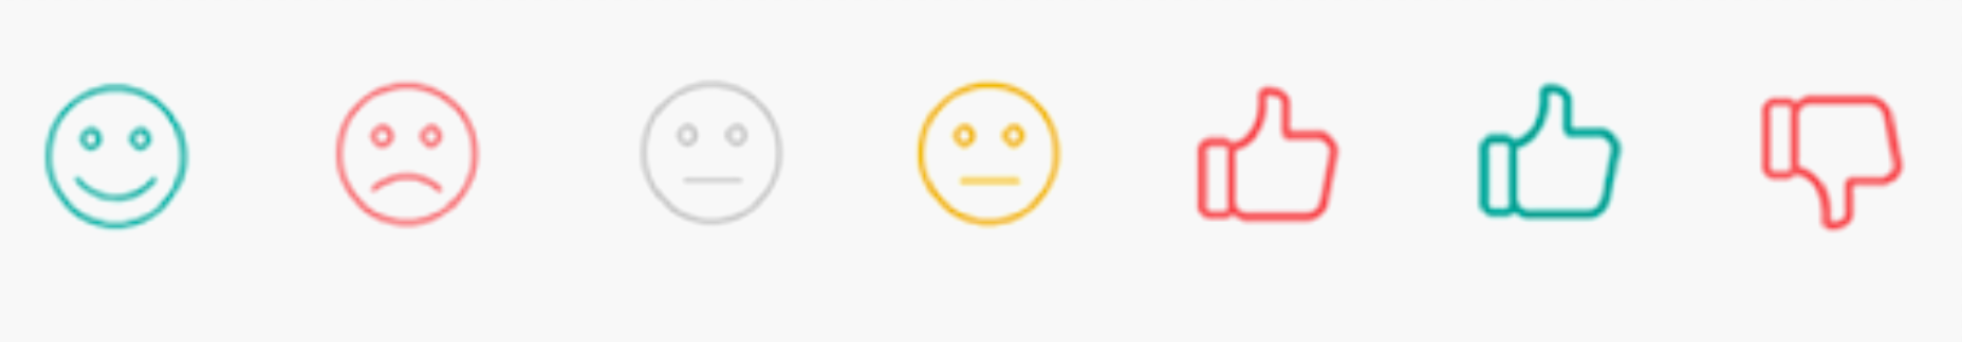 Ethnio NPS emojis